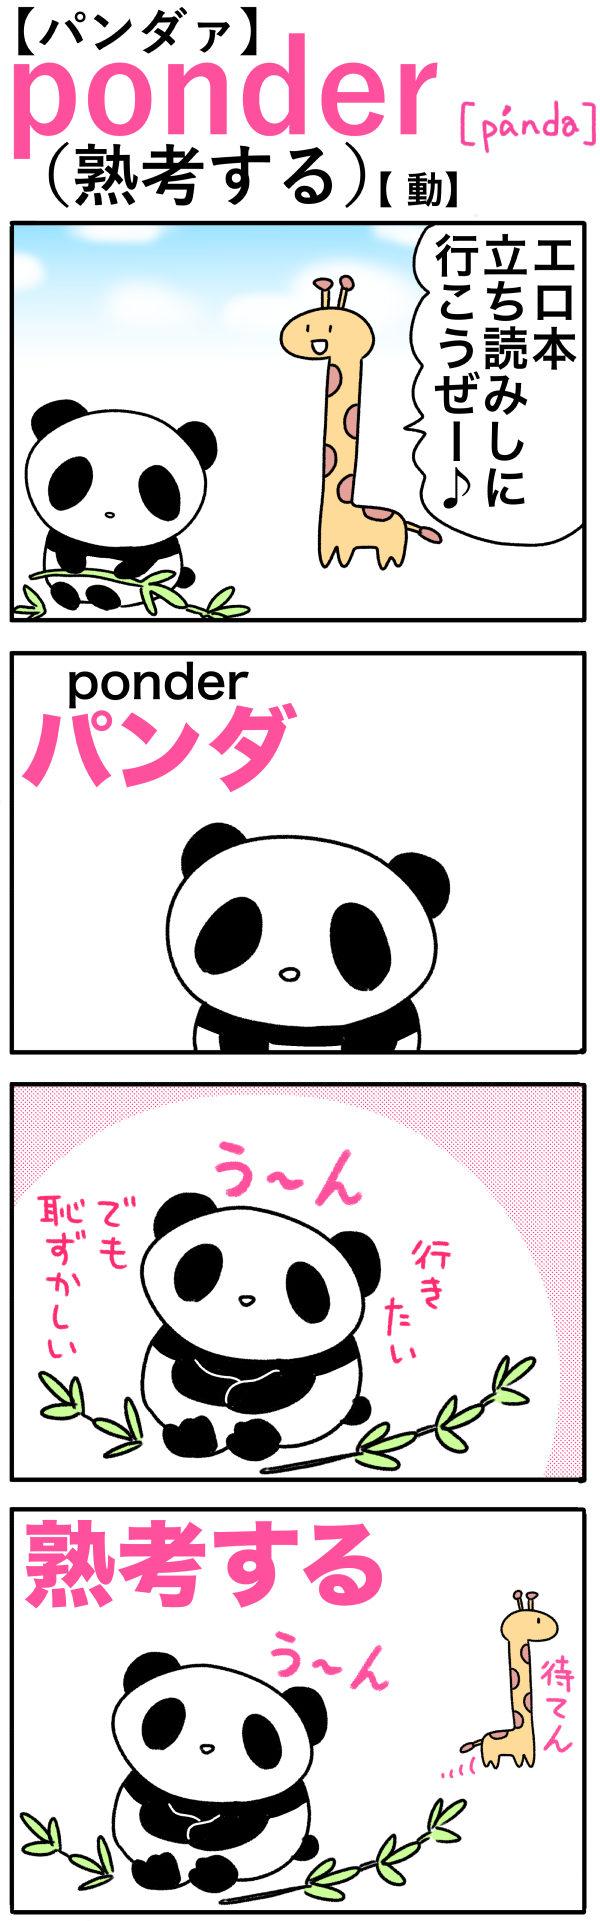 ponder(熟考する)の語呂合わせ英単語